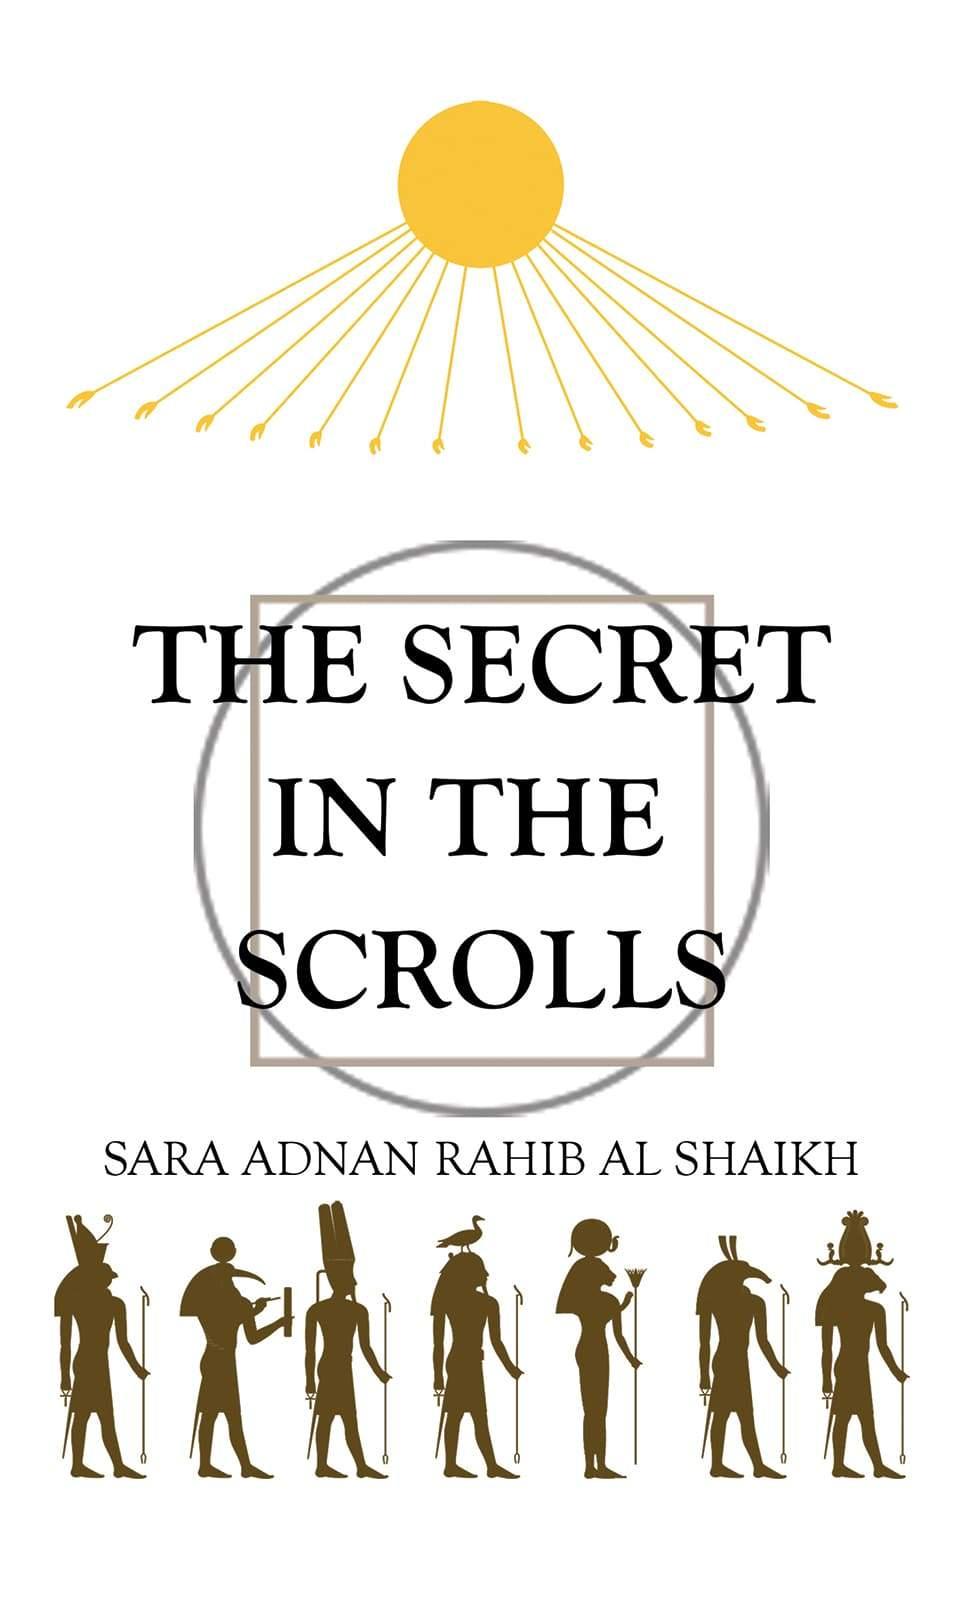 The Secret in The Scrolls